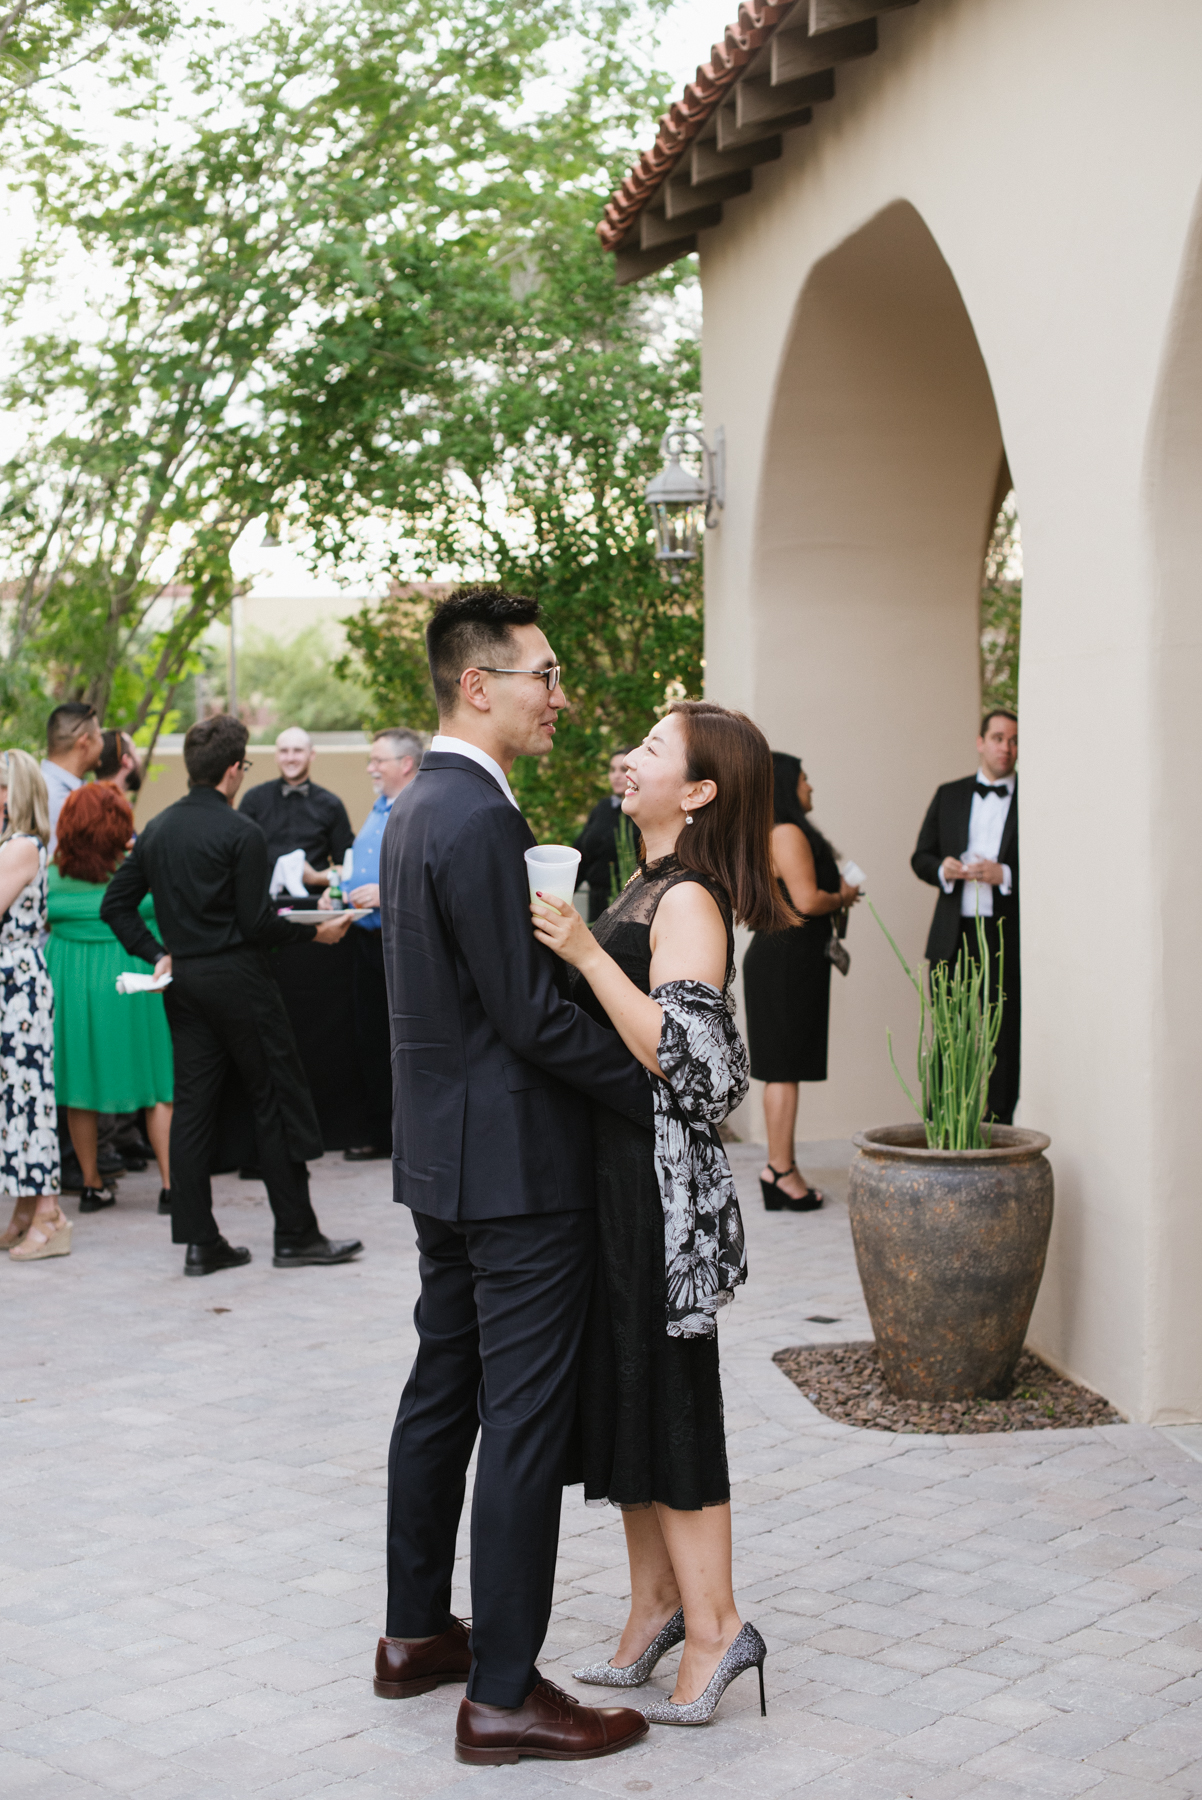 Secret Garden Event Center Wedding - Meredith Amadee Photography-1-9.jpg